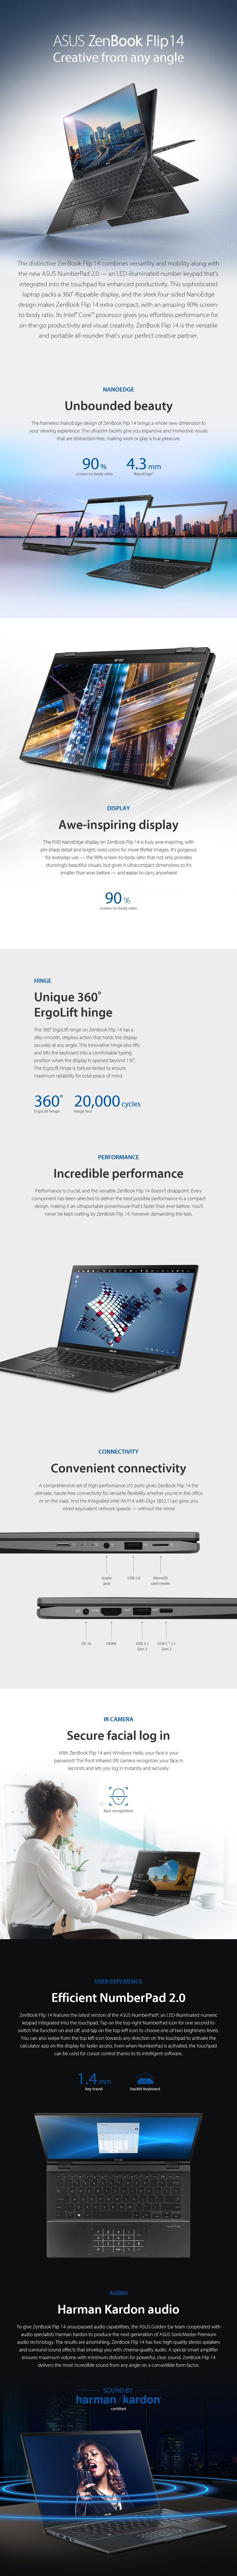 asus-zenbook-flip-14-ux463fa-14-laptop-i510210u-8gb-512gb-w10p-touch-ac32598-7-1-.jpg